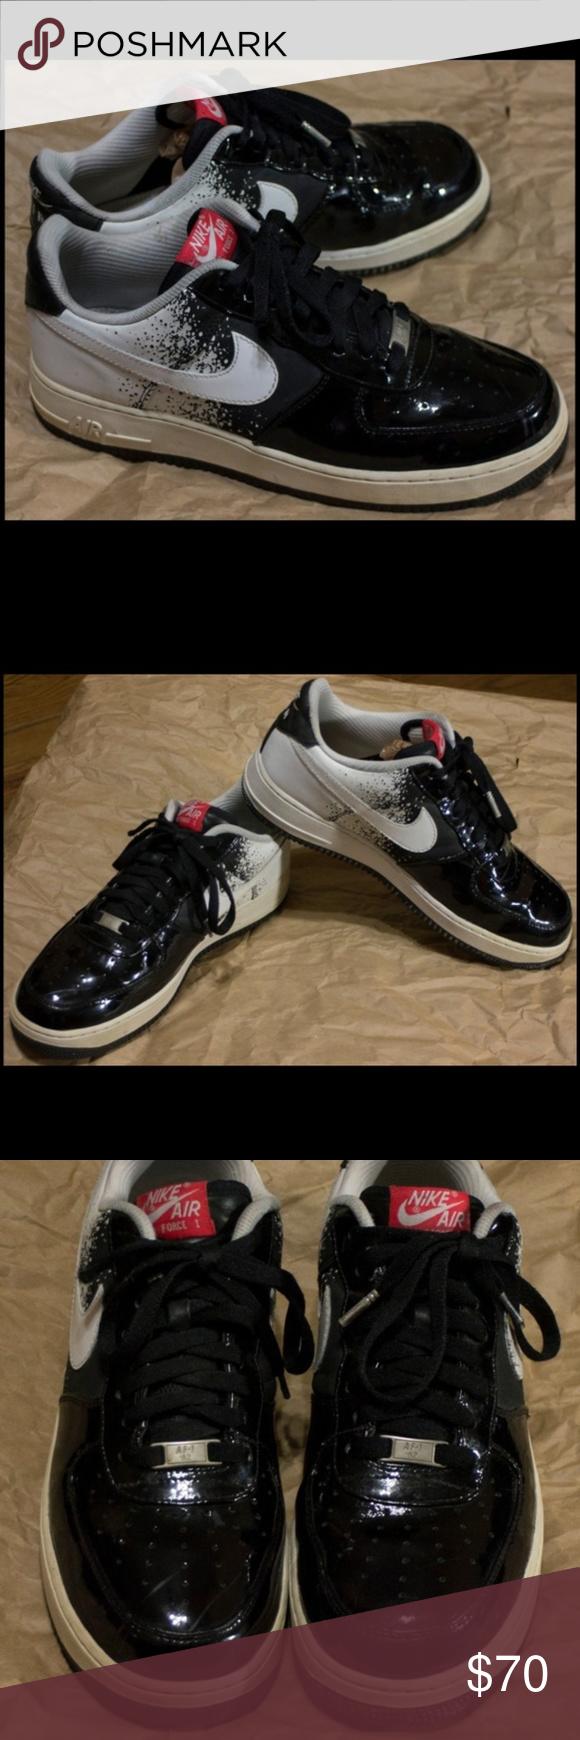 | Nike Air Force 1 Low Premium Shoes 318775 001